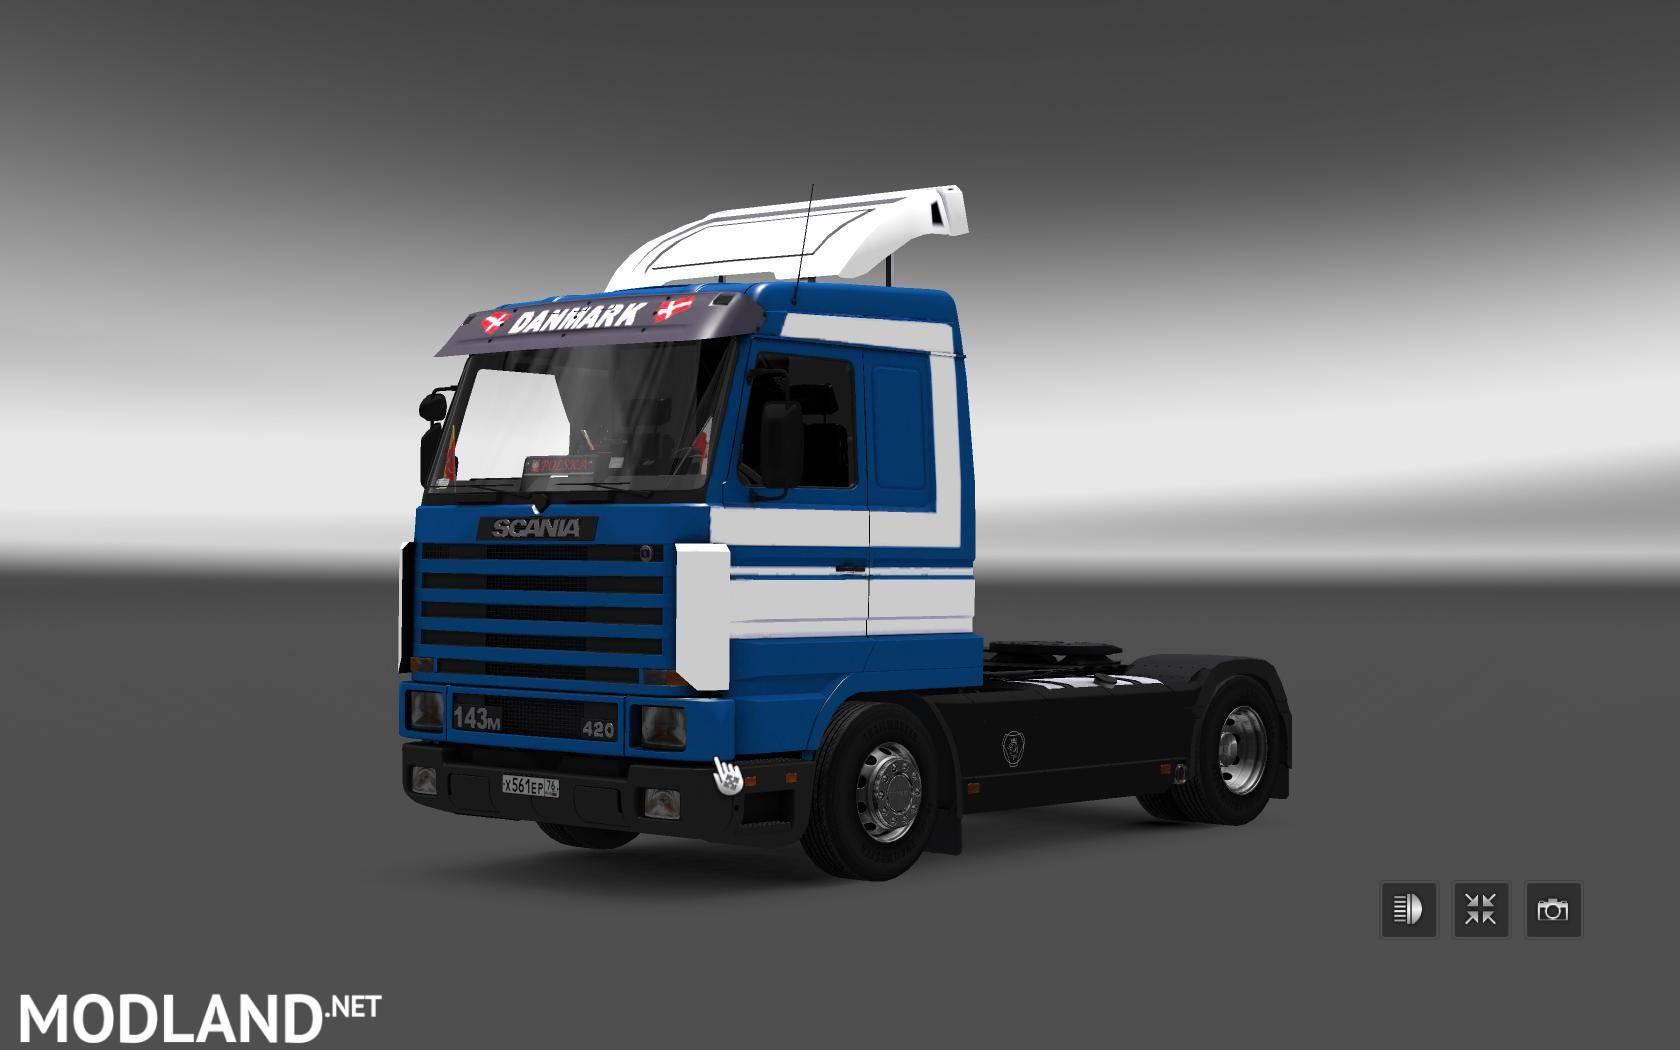 Scania 143 Trailer Shmitz Mod For Ets 2